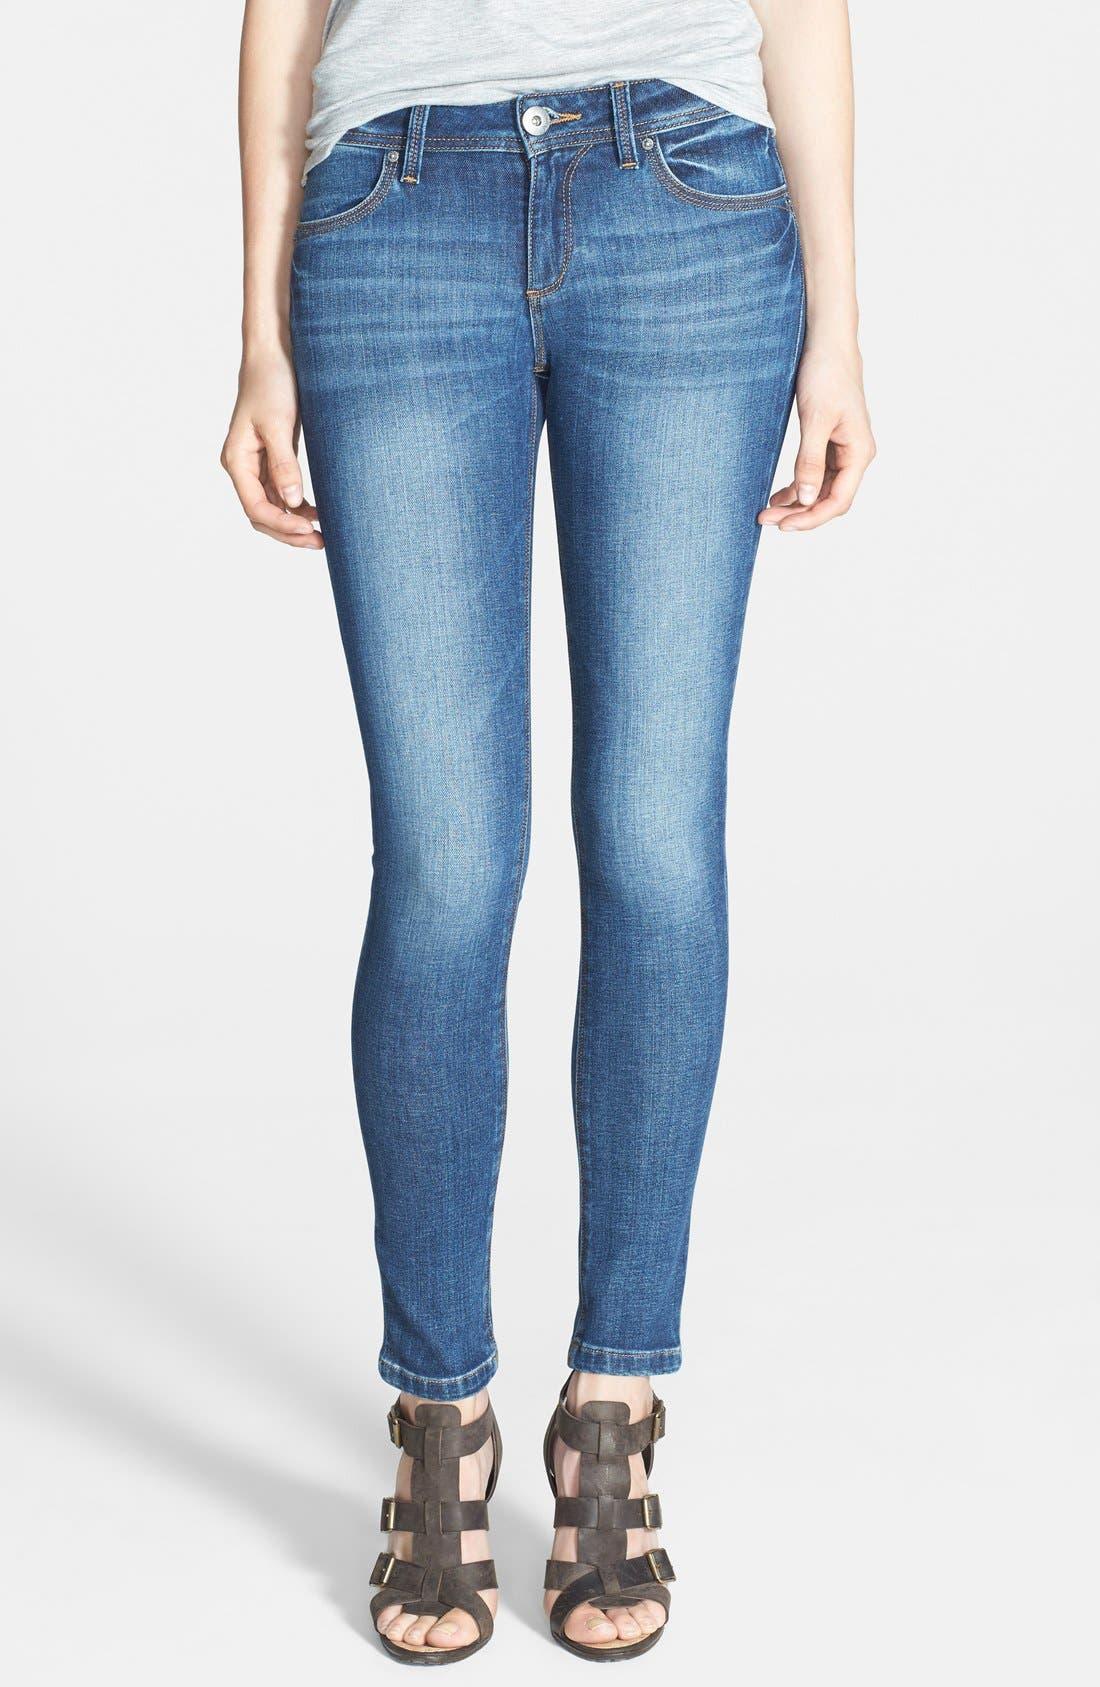 Dl1961 Emma Power Legging Jeans Cashel Nordstrom